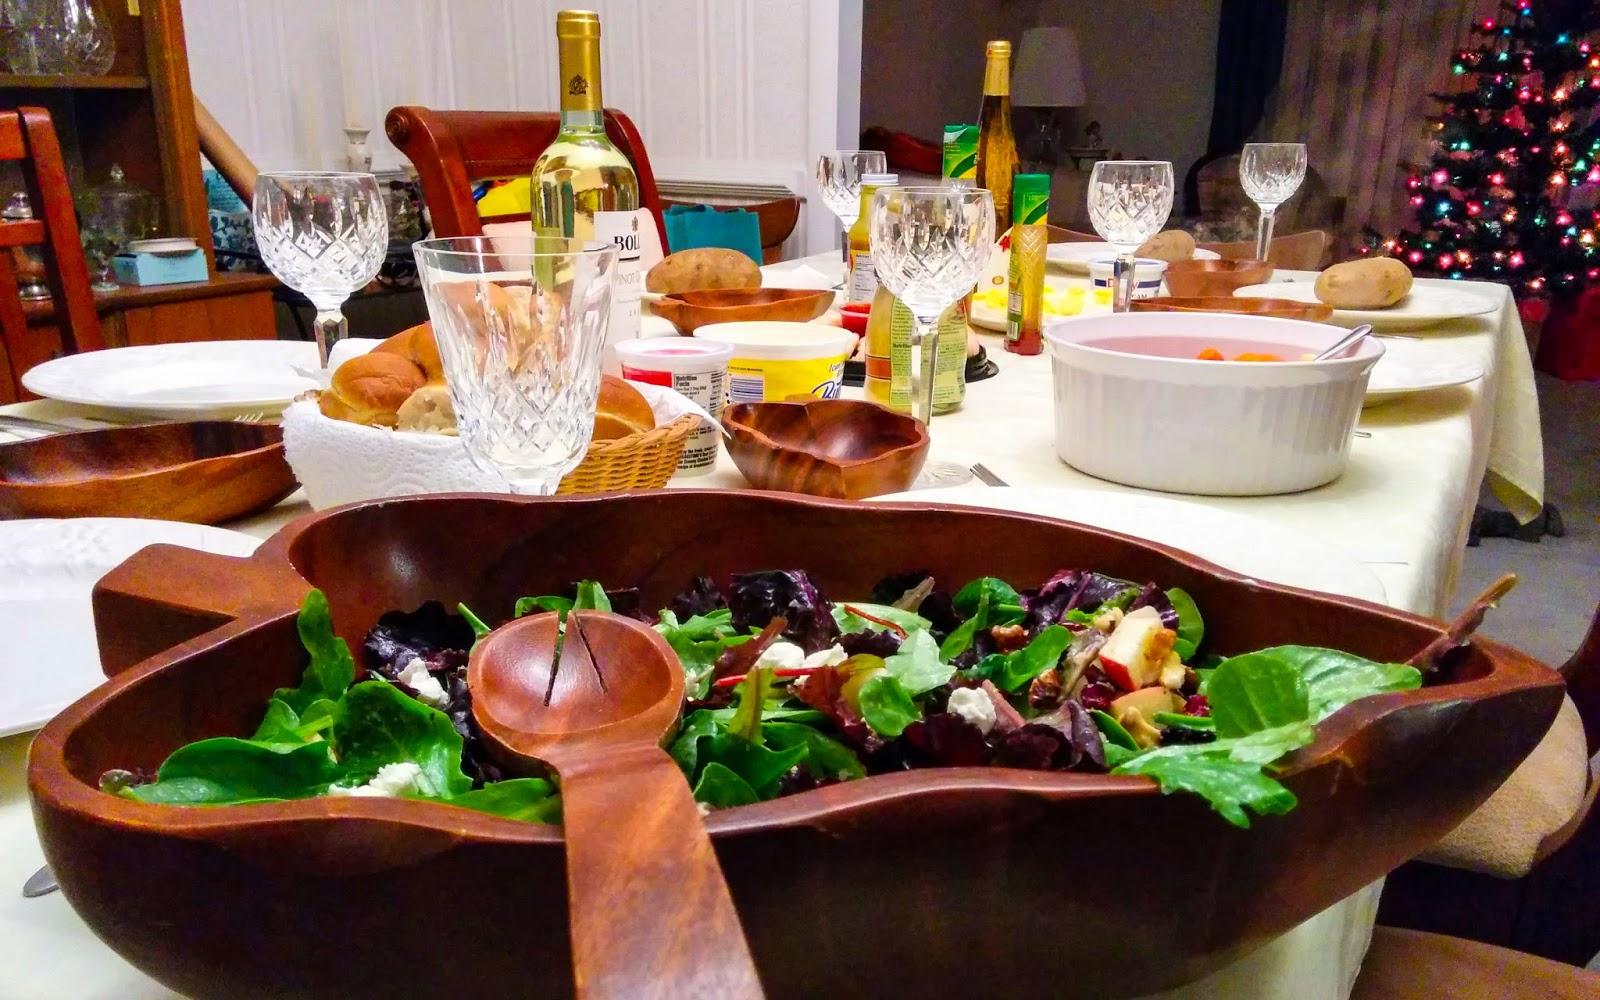 walnut apple salad for #weekdaysupper